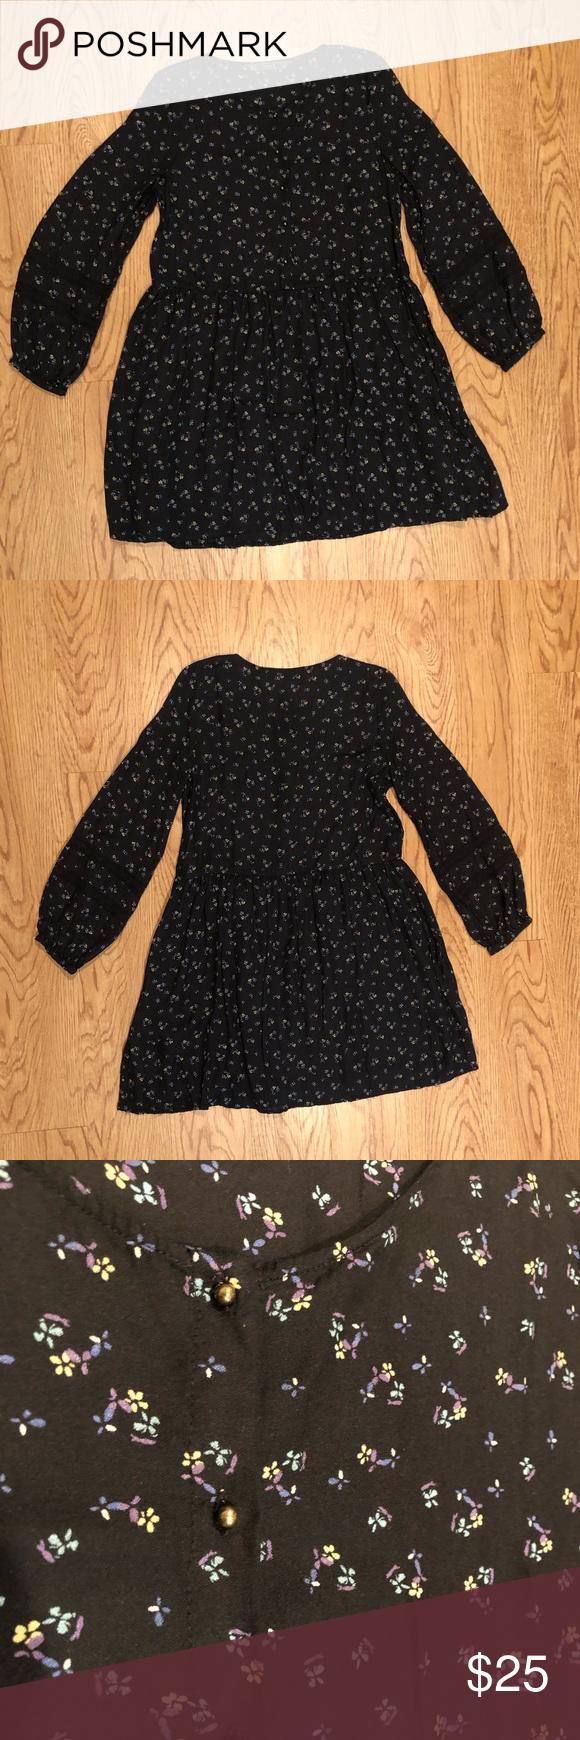 26++ Black floral babydoll dress inspirations